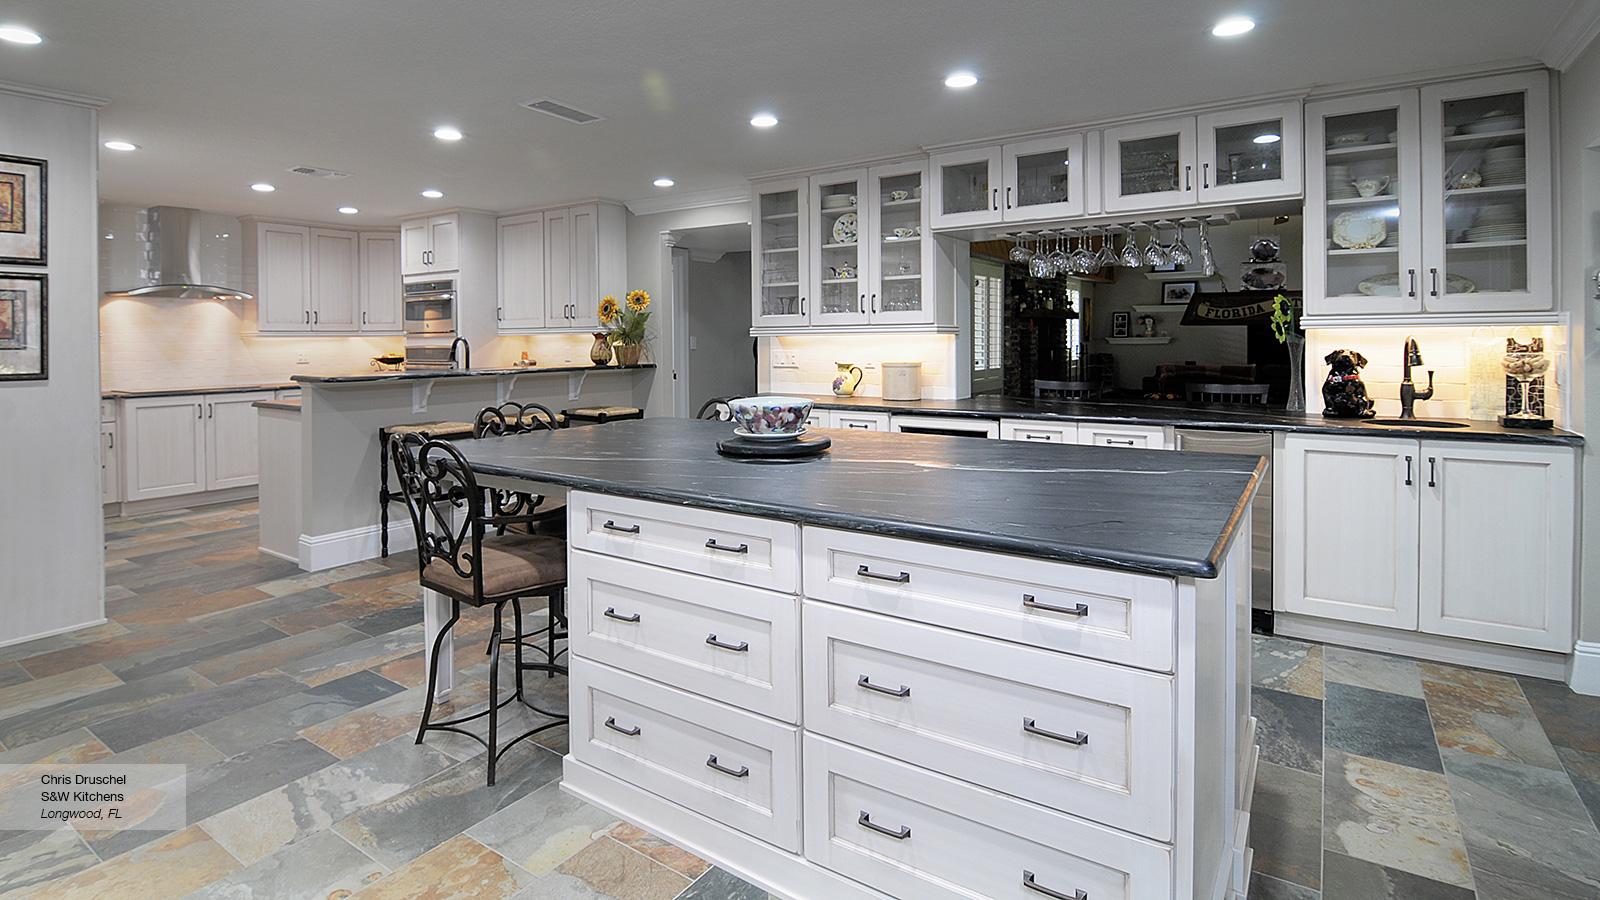 Best Kitchen Gallery: Pearl White Shaker Style Kitchen Cabi S Omega of Shaker Style Kitchen Cabinets on rachelxblog.com